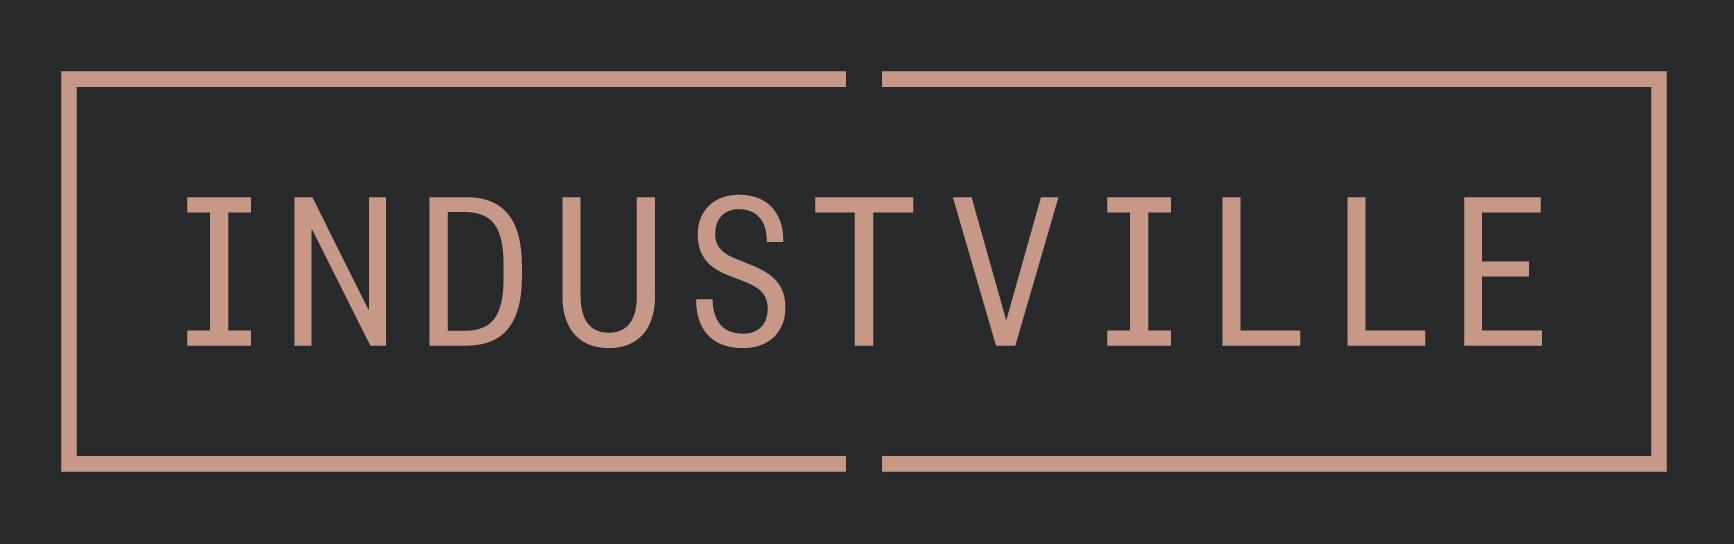 Industville Logo.